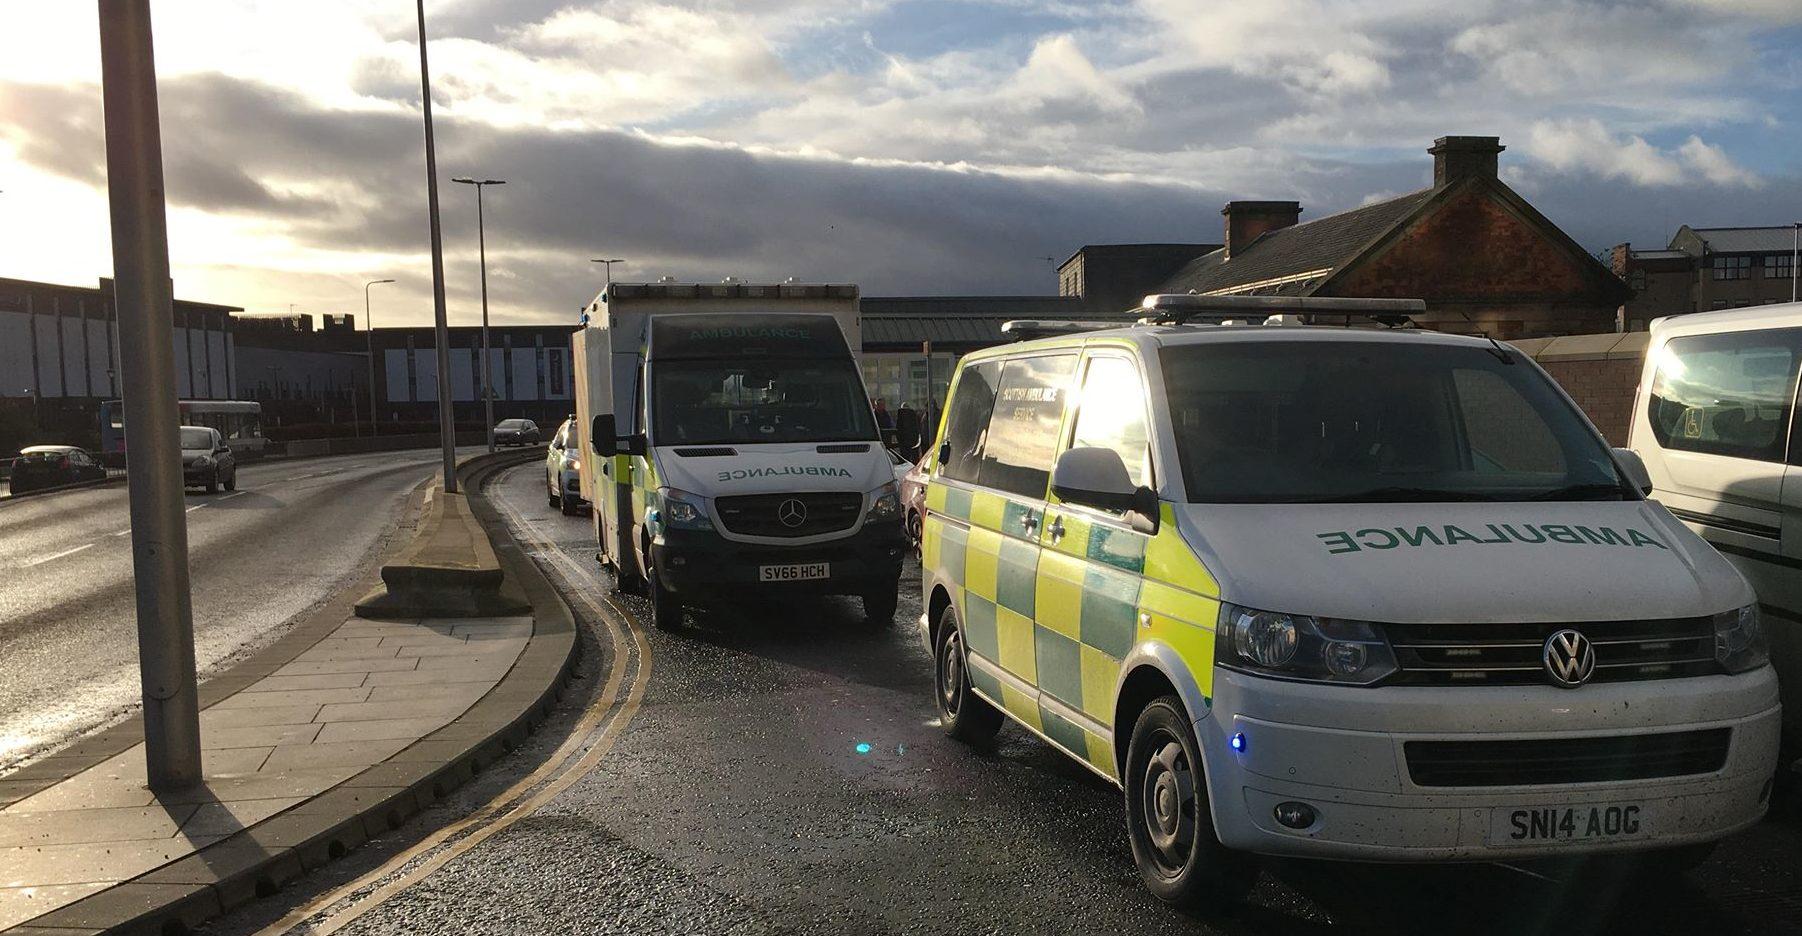 Ambulances at Dundee Railway Station.